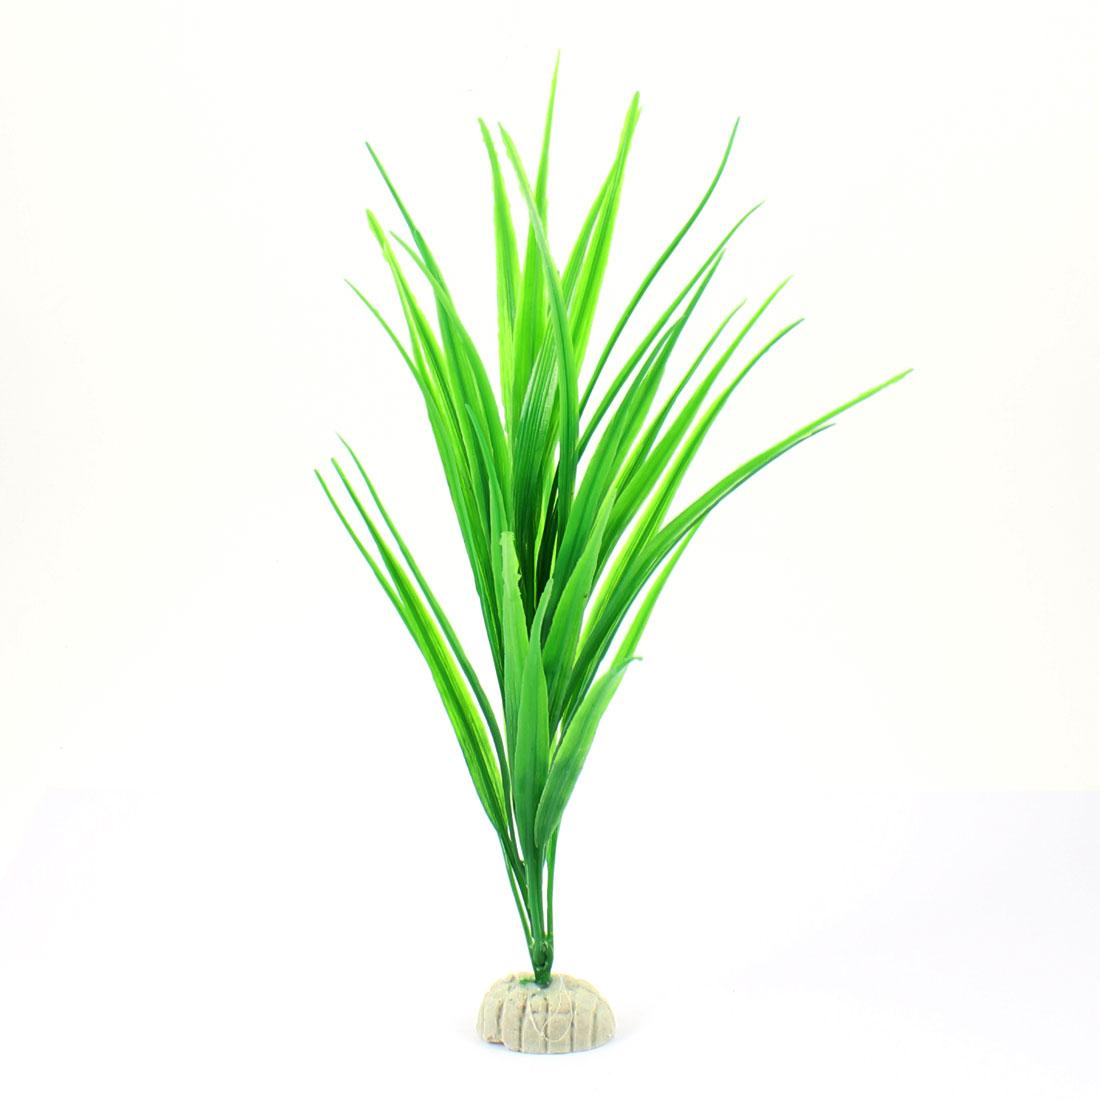 "Aquarium Tank Green Plastic Grass Plant Decoration 10.6"" Height"